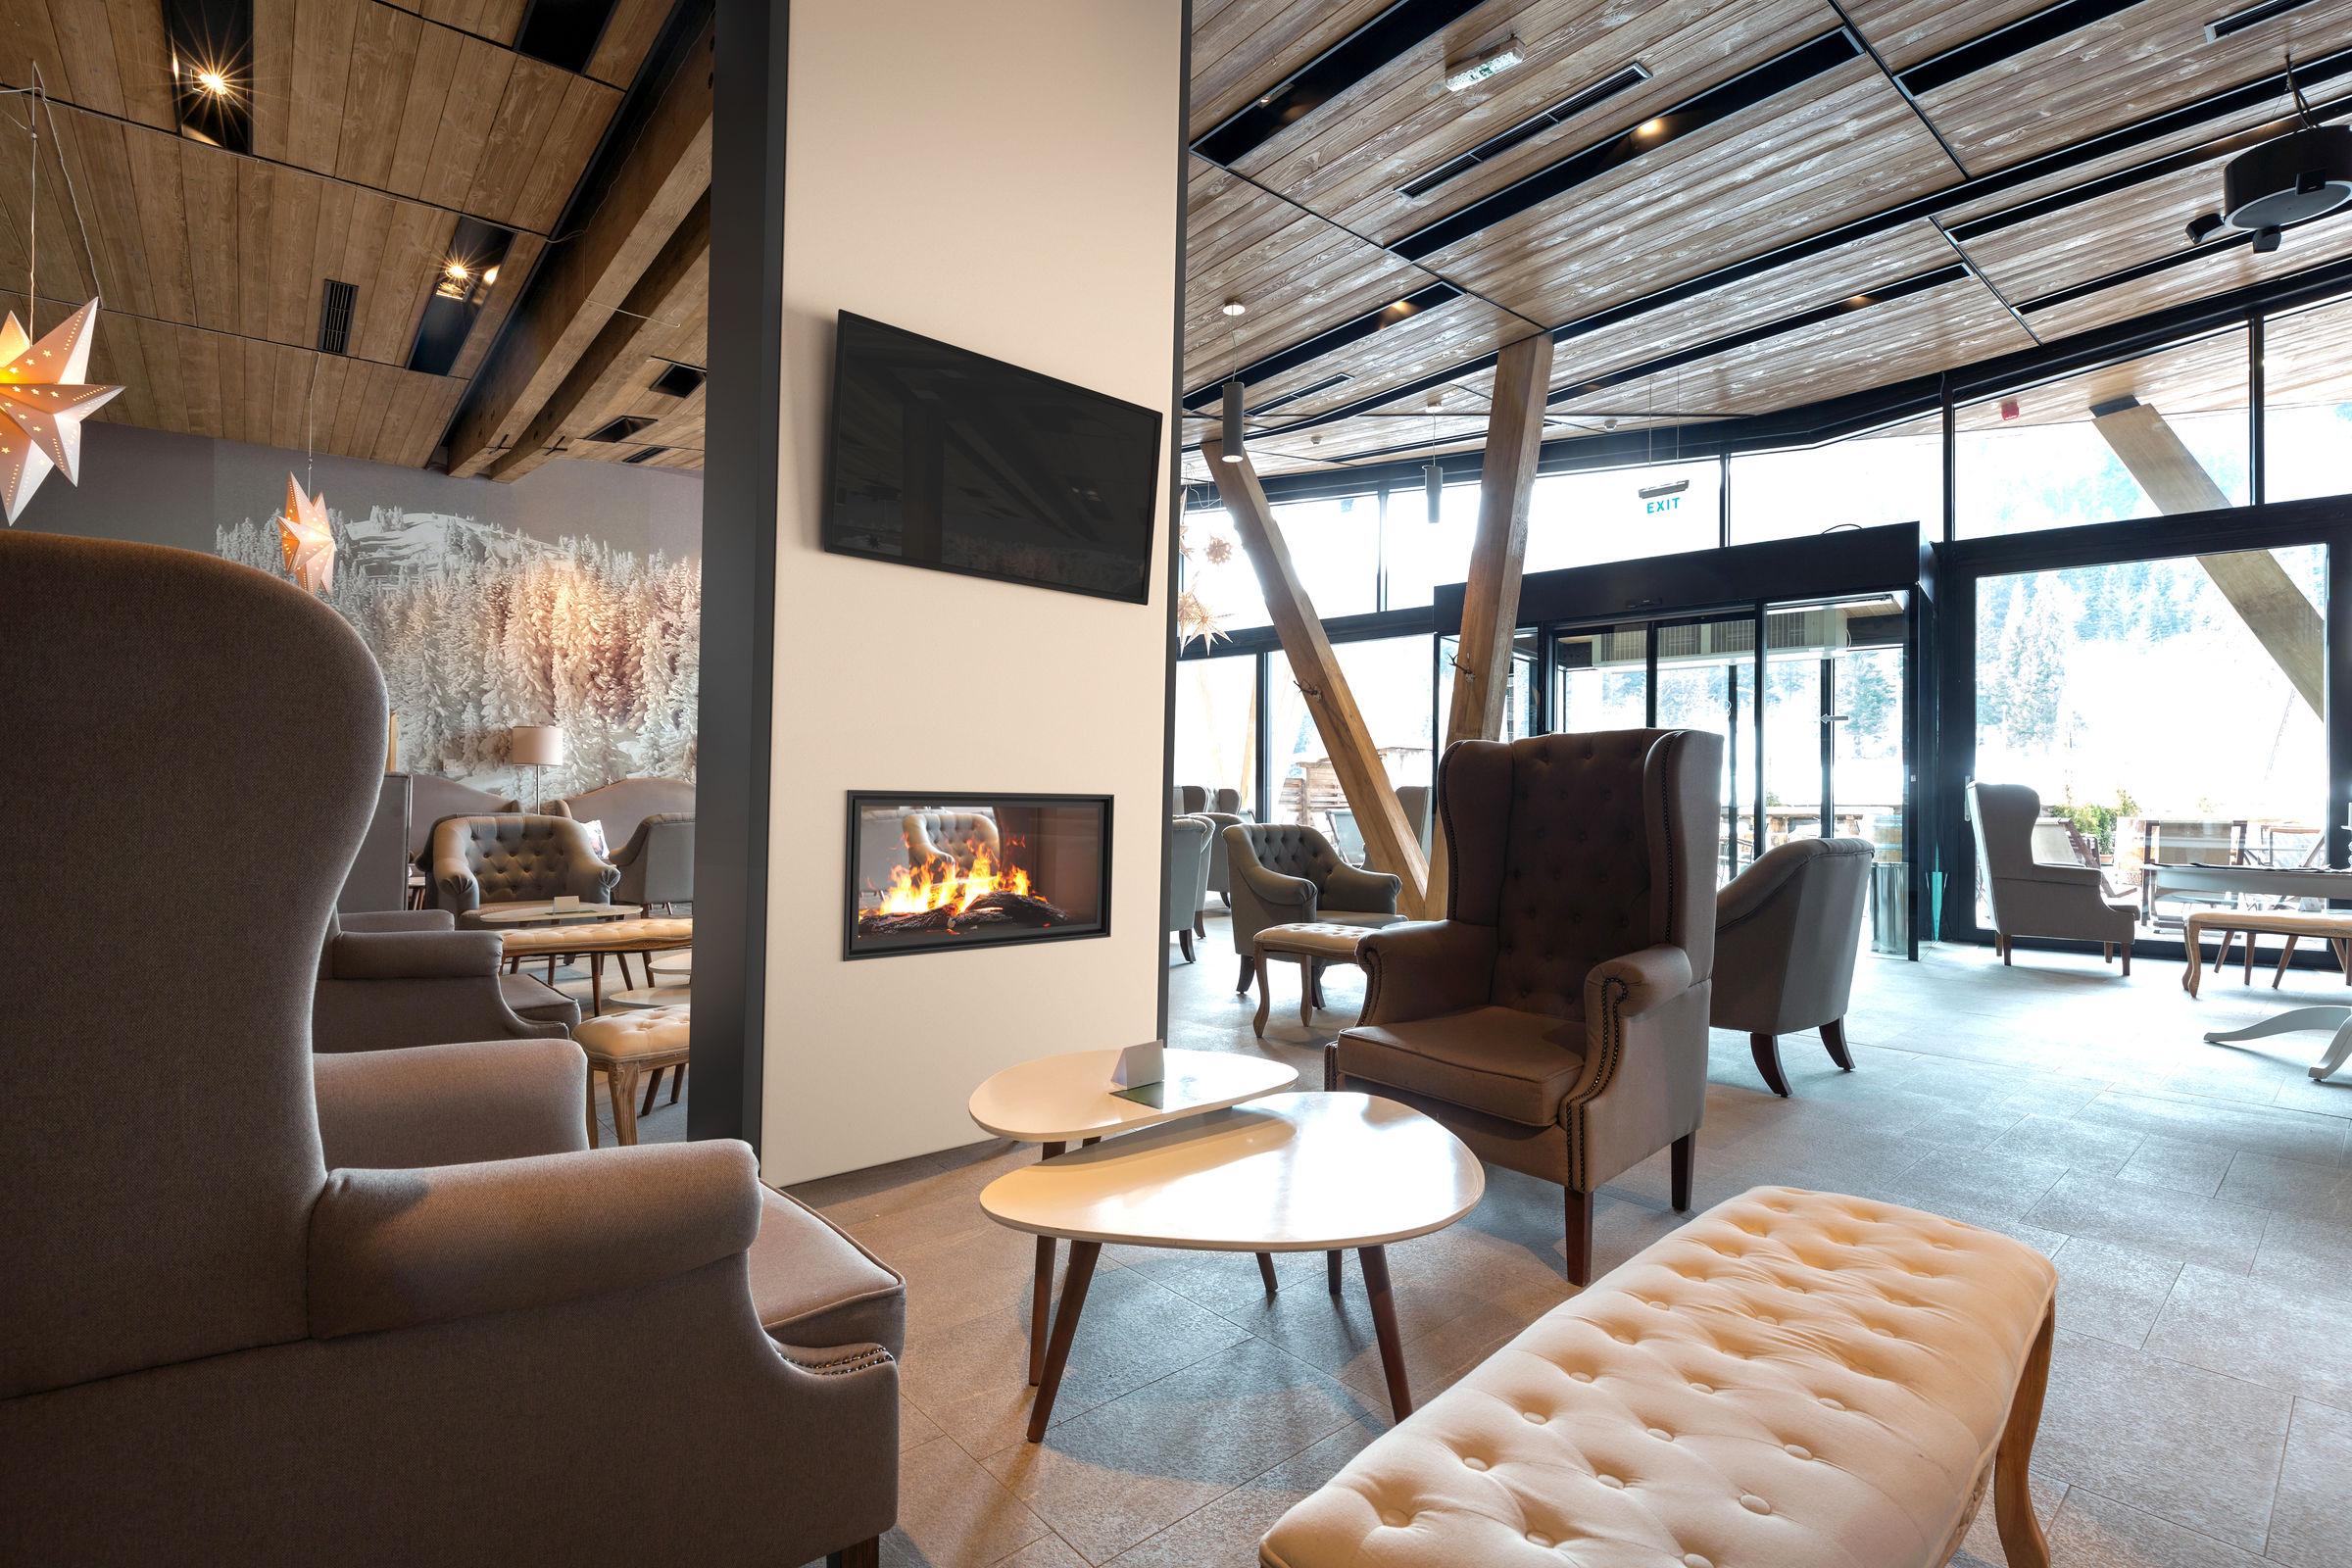 36 Inch See-Thru | Built-In Linear Vapor-Fire Fireplace